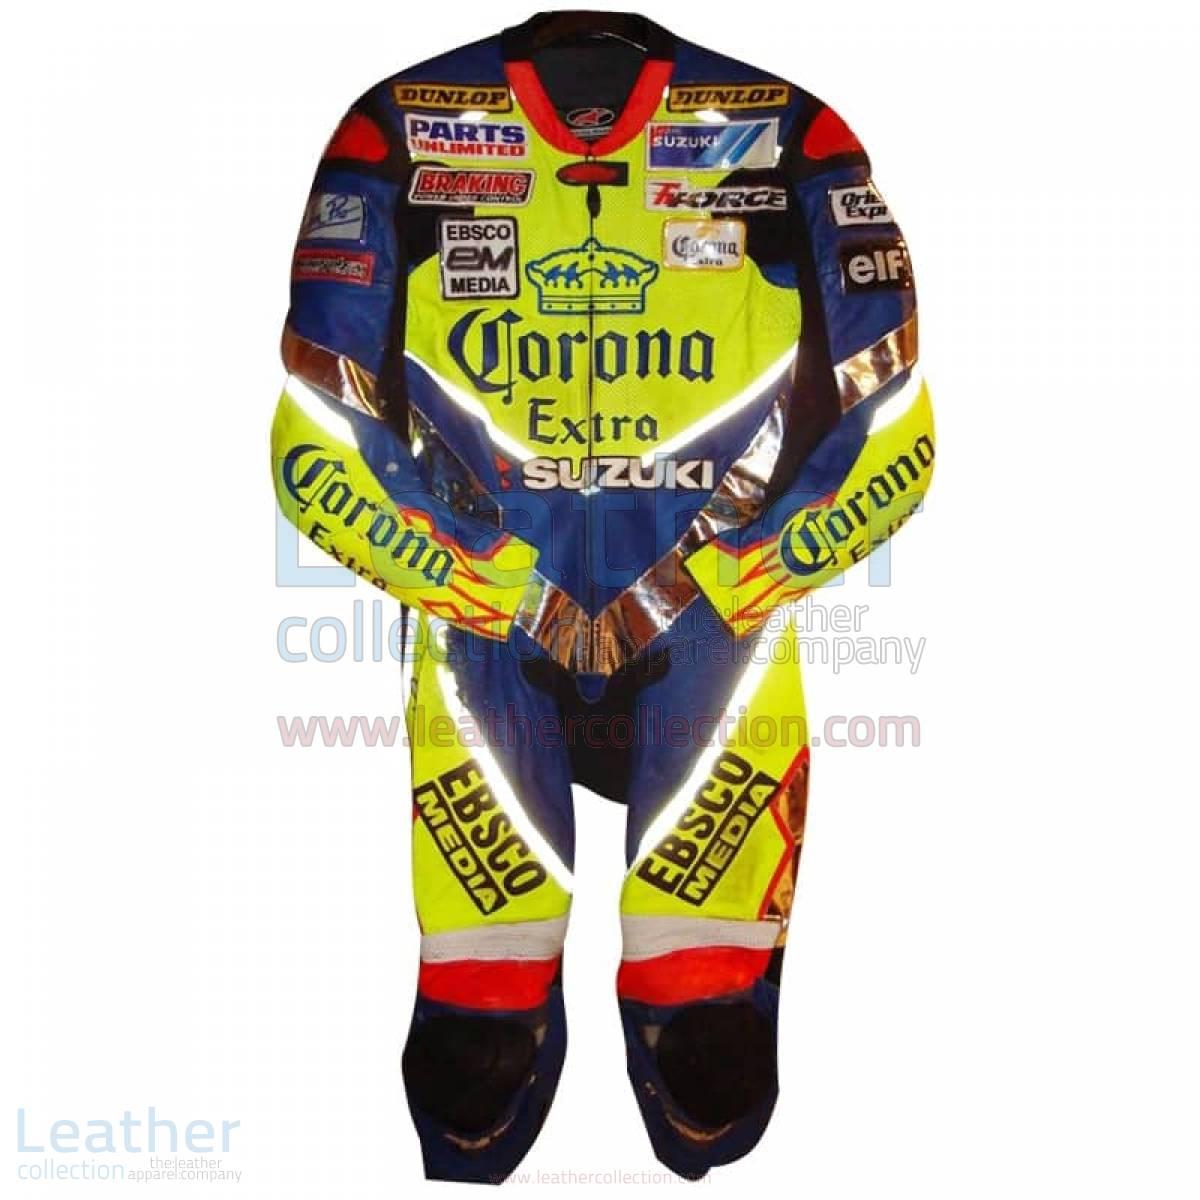 Anthony Gobert 2003 Corona Suzuki Race Leathers